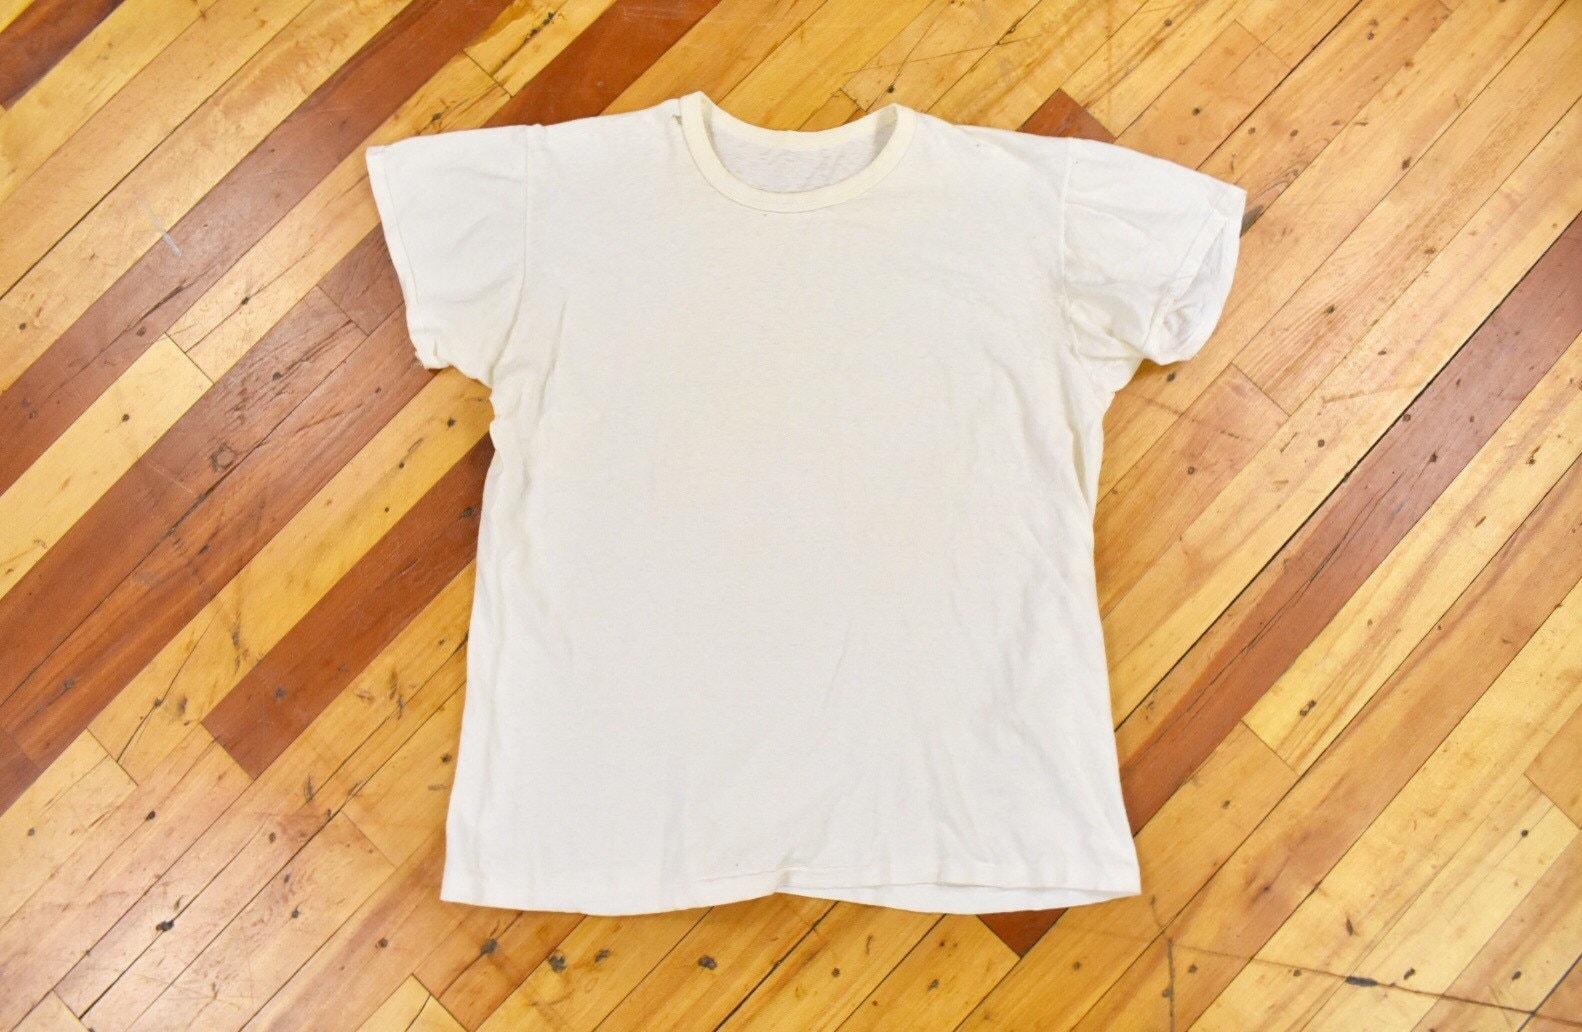 1940s Men's Shirts, Sweaters, Vests 1940S 50S ML Skivvy Tee Plain White T-Shirt Vintage 100 Cotton $20.00 AT vintagedancer.com